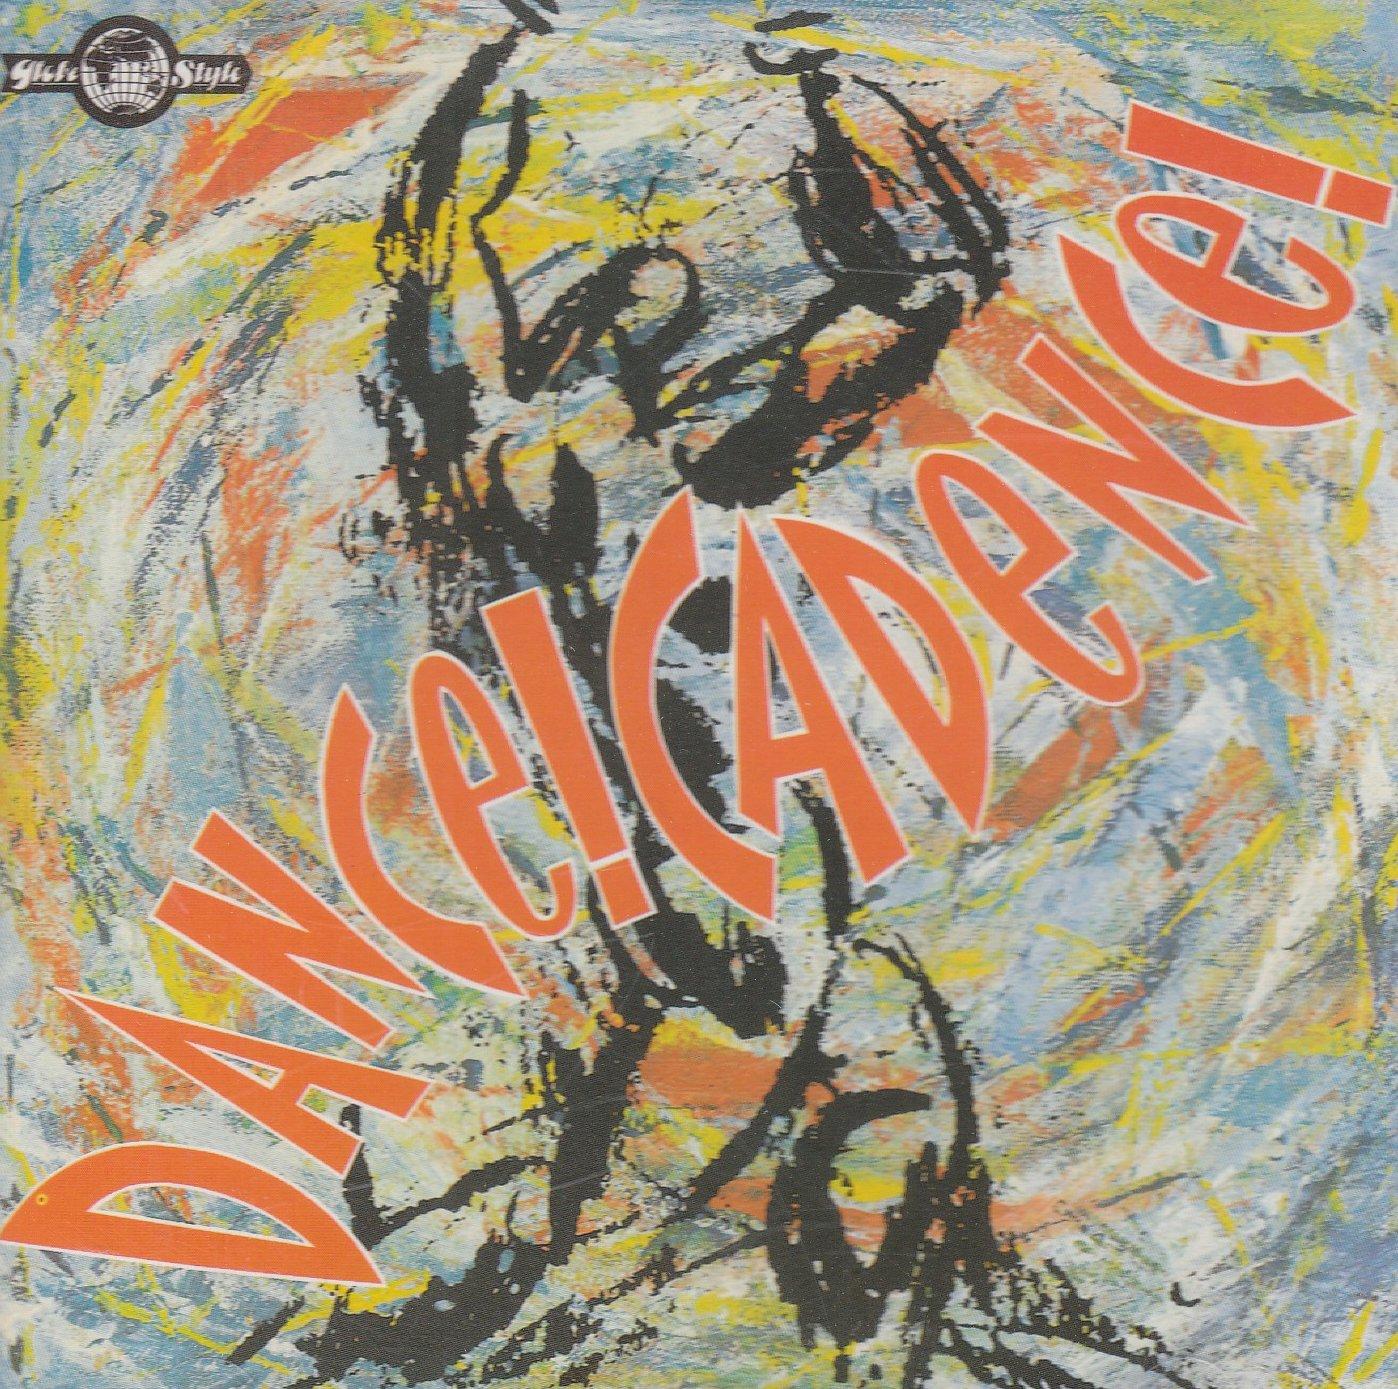 Dance Cadence